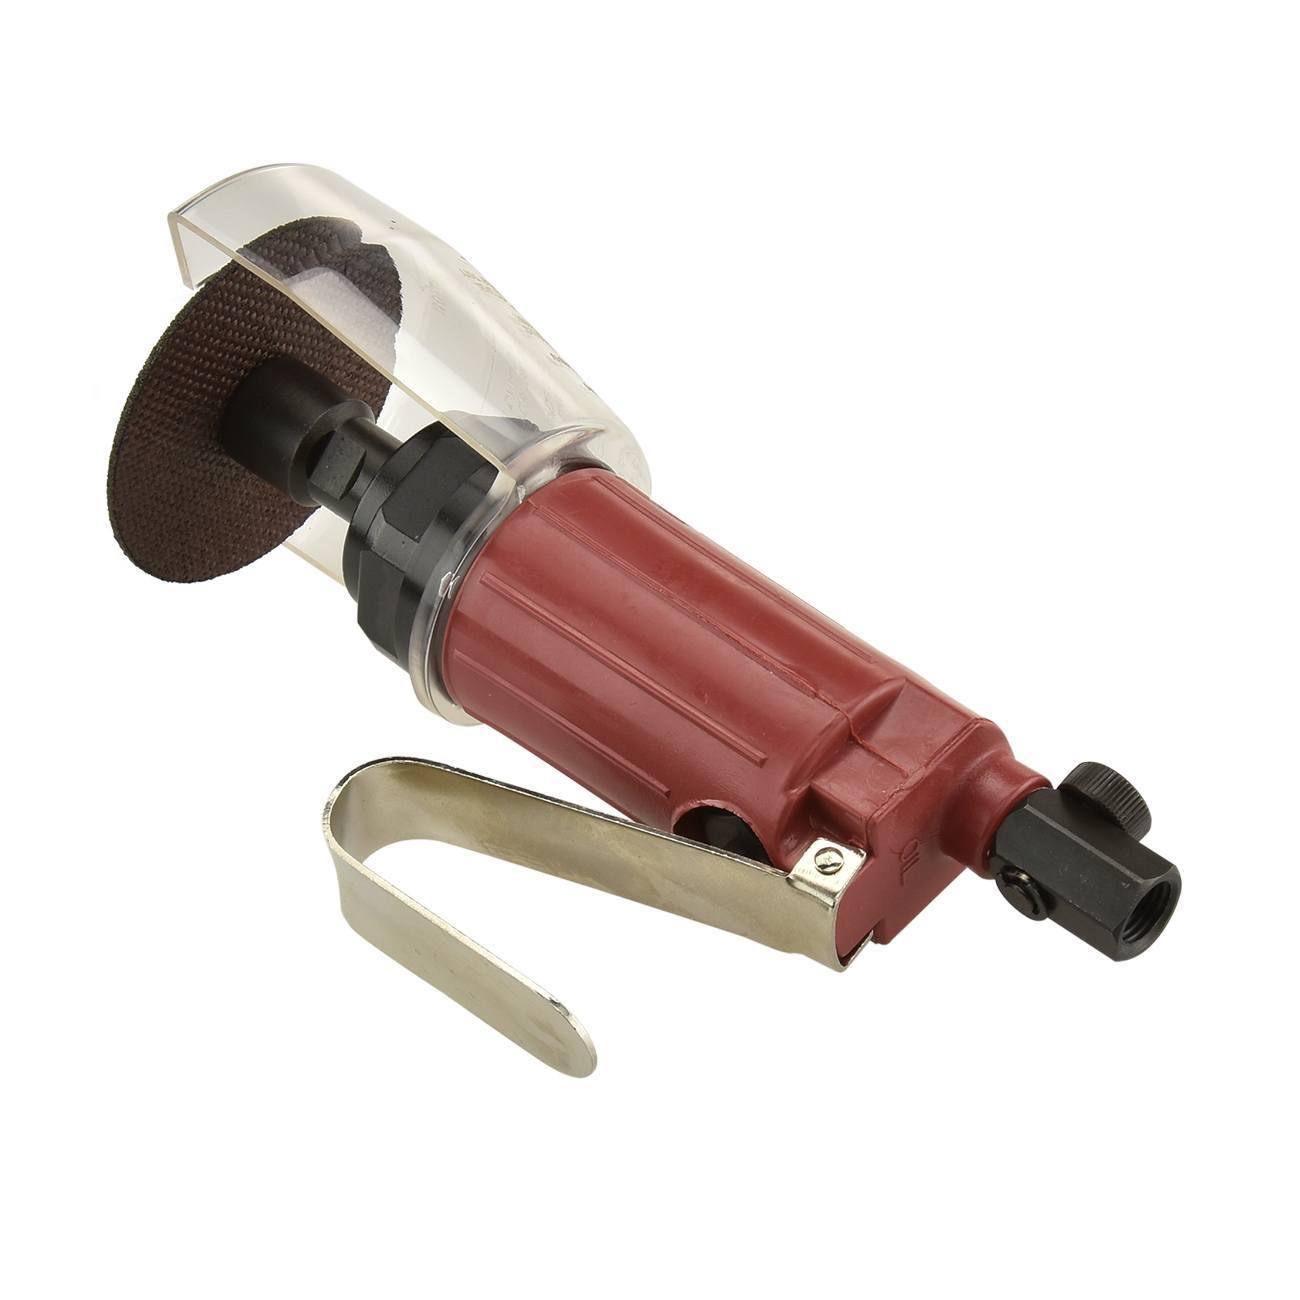 "3"" High Speed Air Cut Off Tool Pneumatic Power Metal ..."